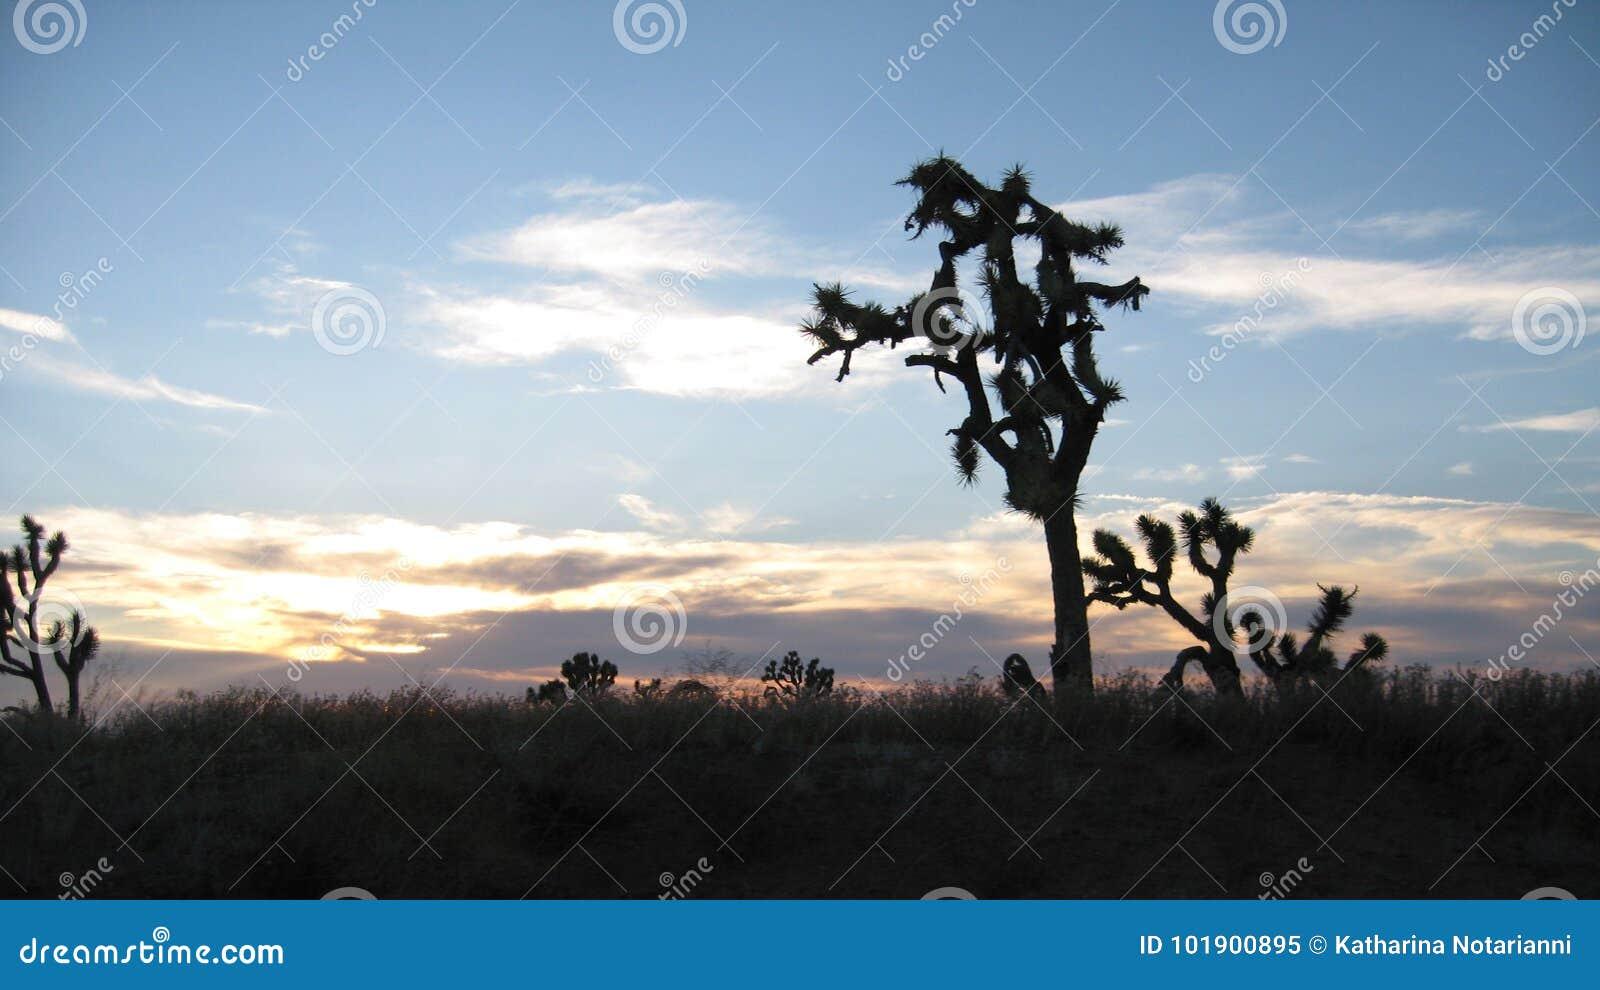 Joshua Trees at Grand Canyon West Rim in Northwestern Arizona